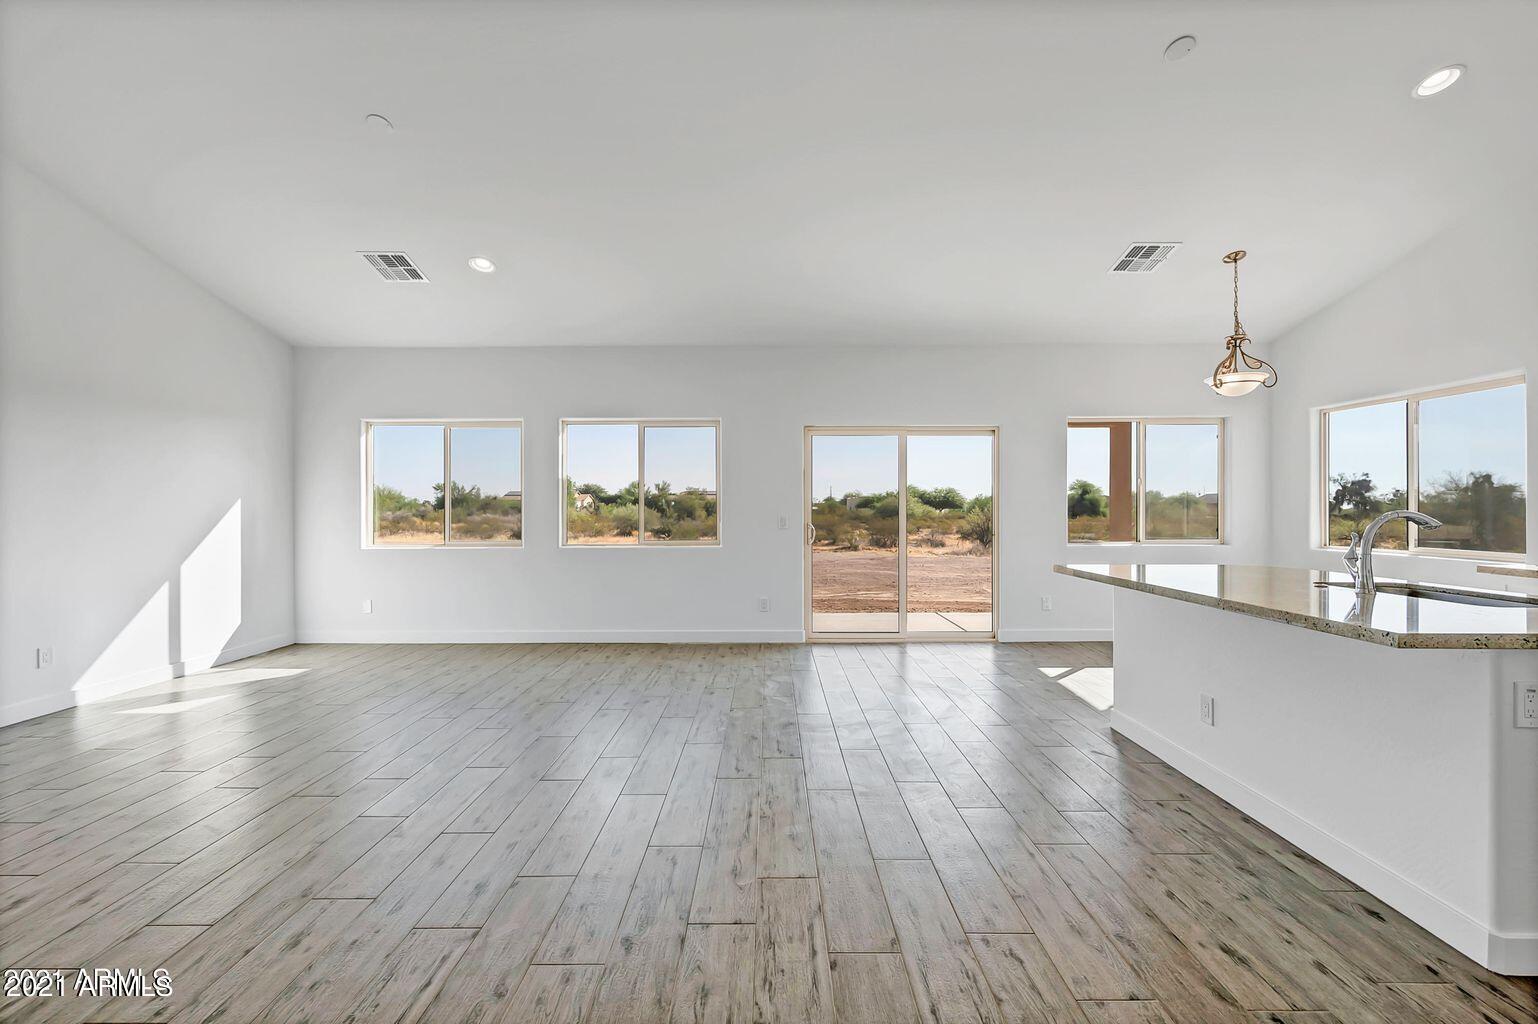 165XX Morning Vista Lane, Scottsdale, Arizona 85262, 3 Bedrooms Bedrooms, ,2 BathroomsBathrooms,Residential,For Sale,Morning Vista,6225669